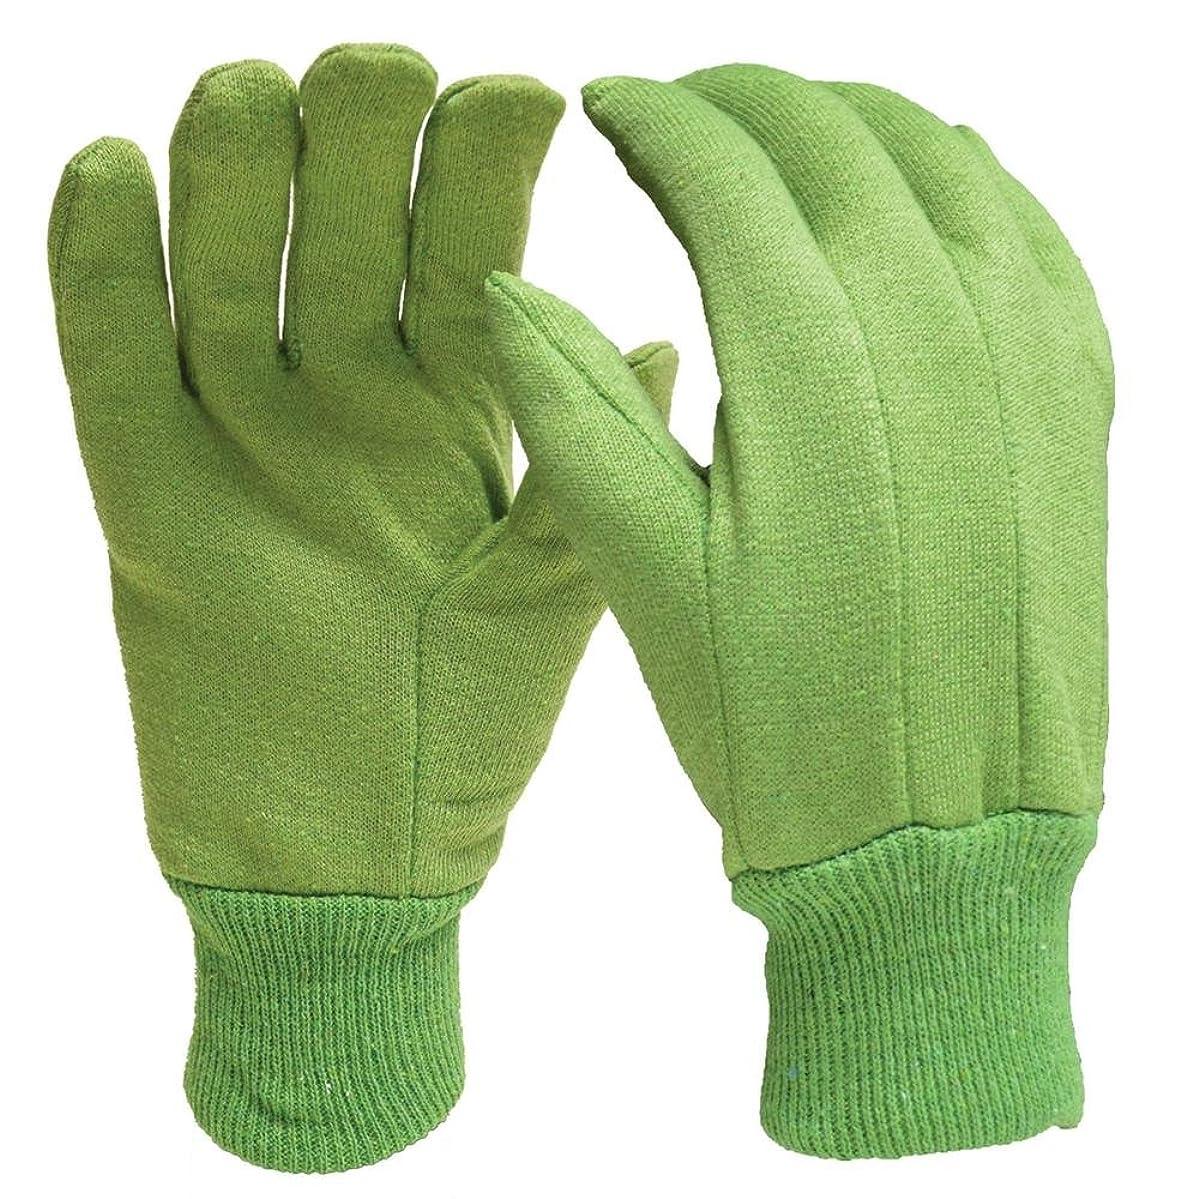 DIGZ (3X 3-Packs) - Gardening Cotton Jersey Gloves (9 Pairs Total)